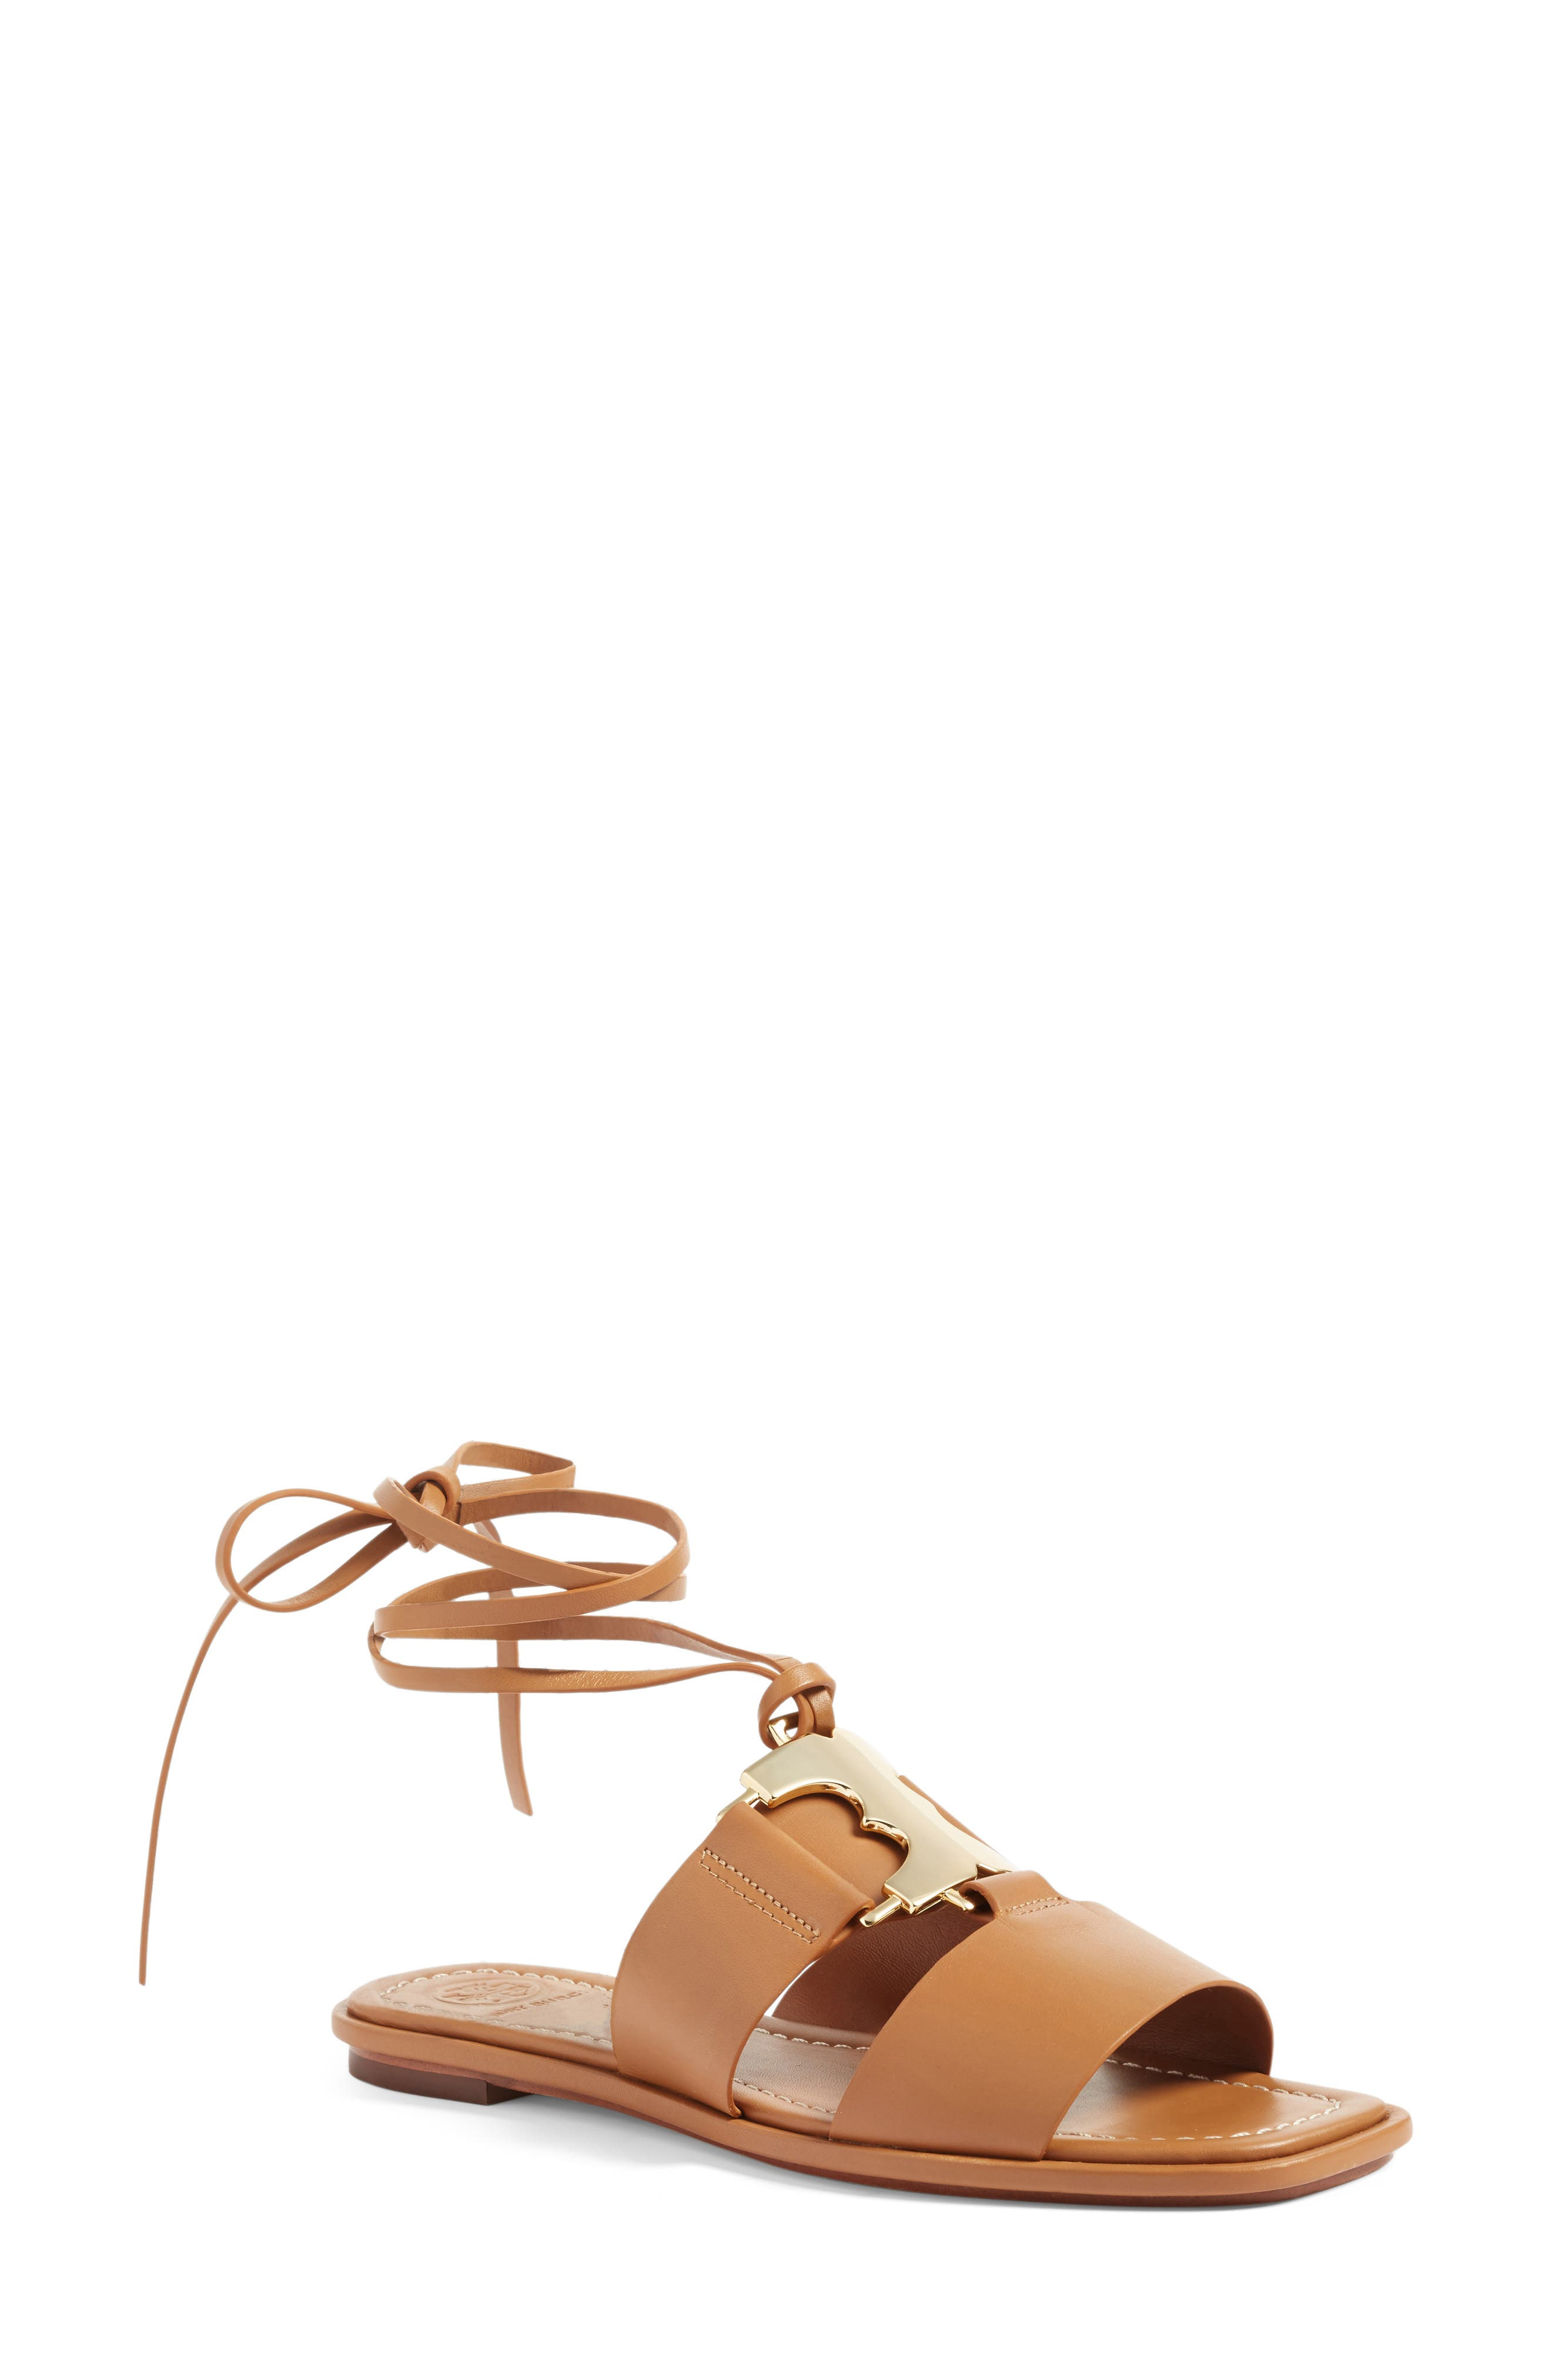 Main Image - Tory Burch Gemini Link Sandal (Women)